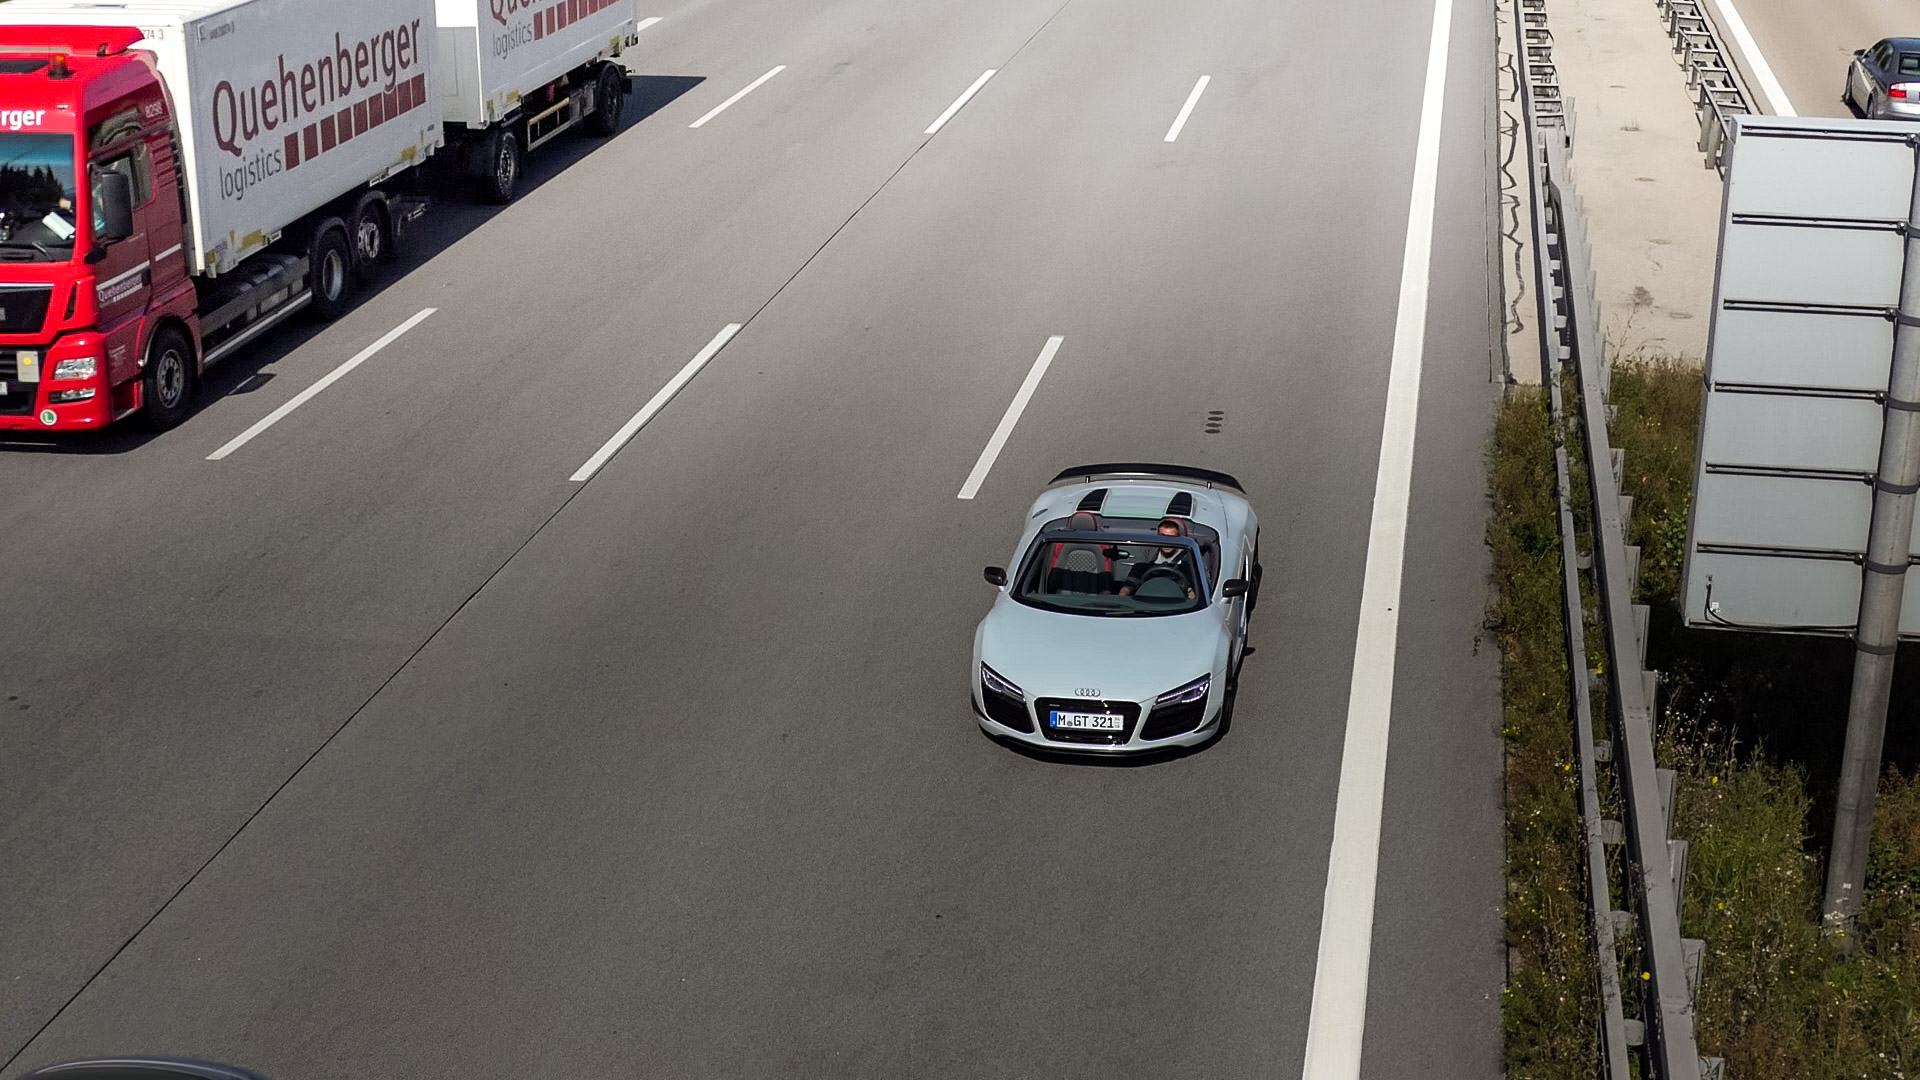 Audi R8 Spyder GT (1of333) - M-GT-321